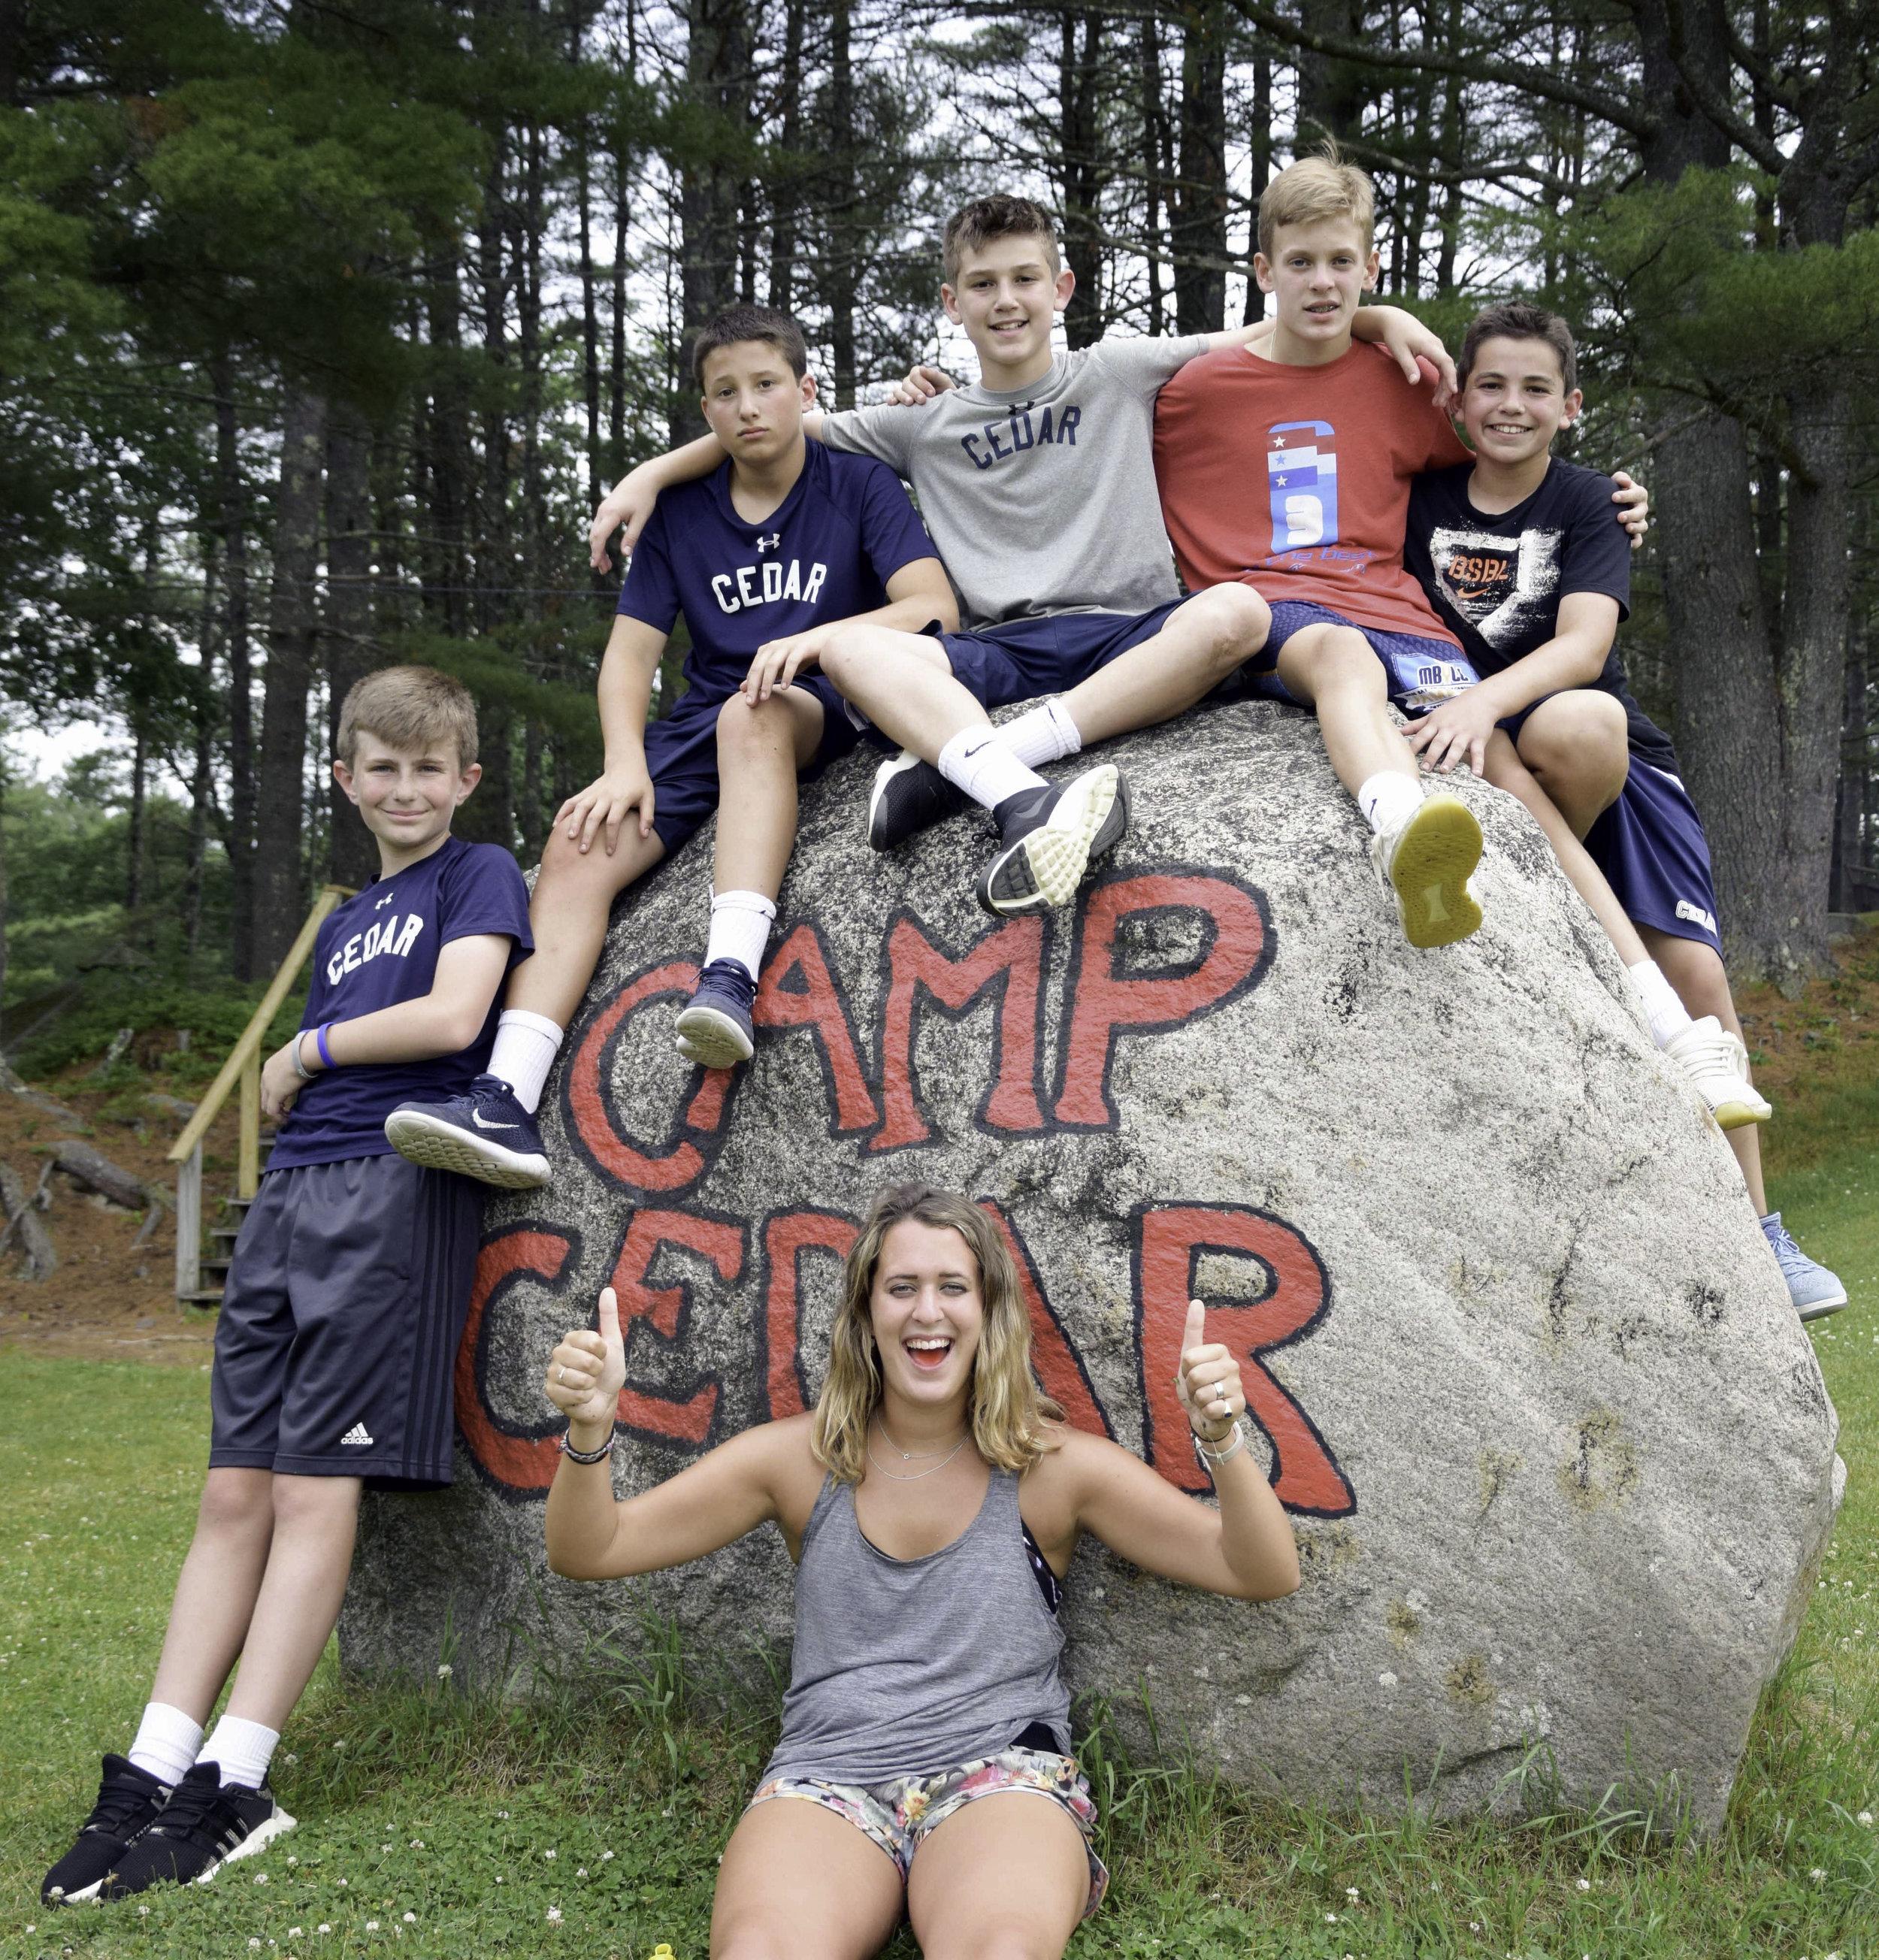 Cedar Rocks (kids and staff).jpg